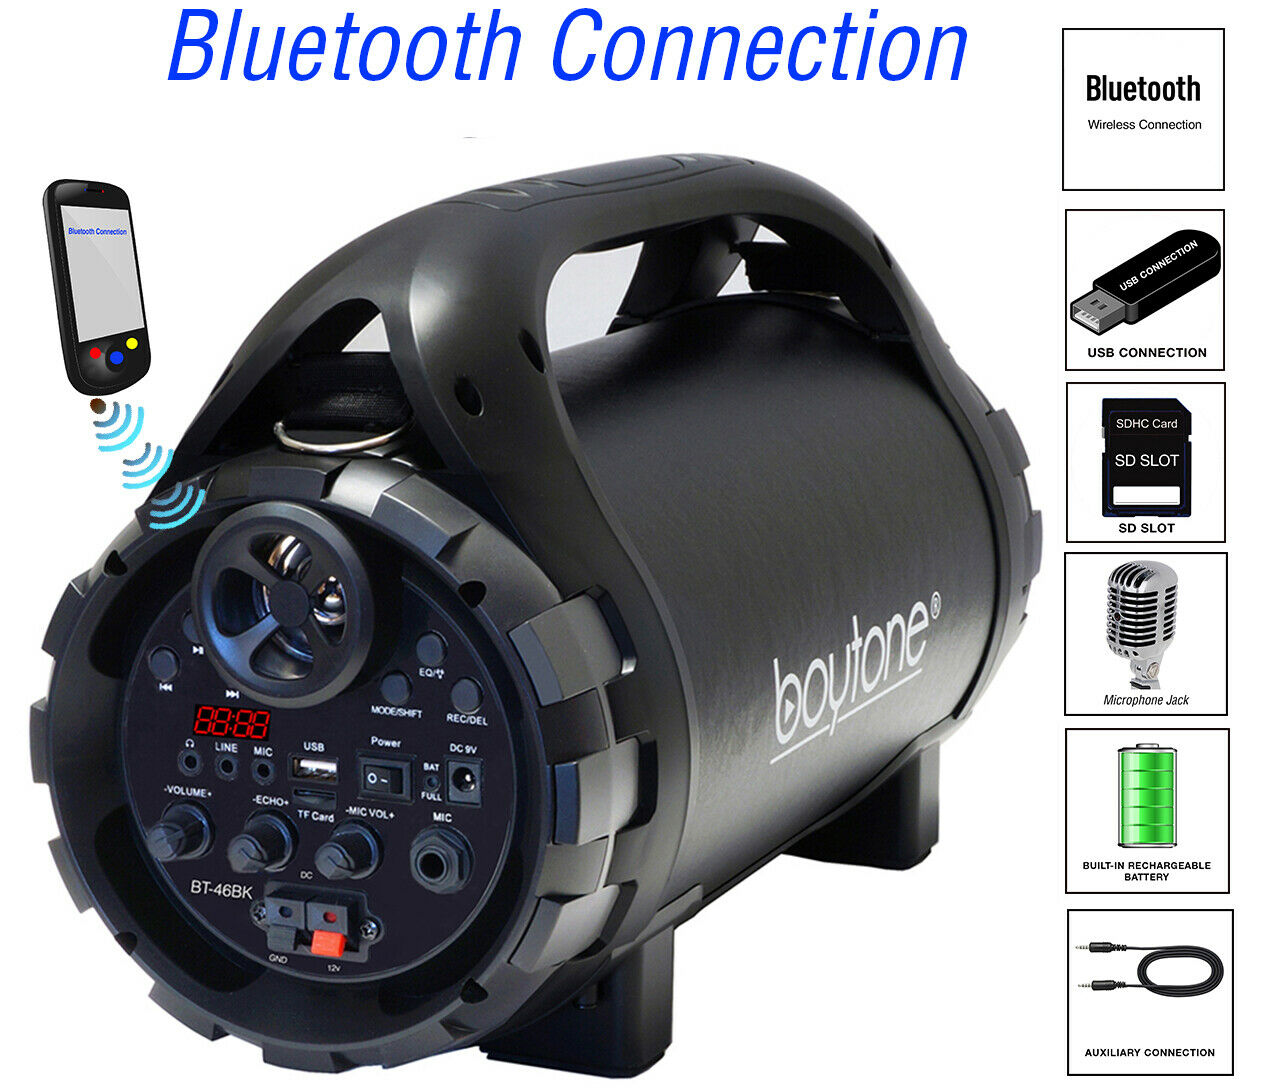 Boytone BT-46BK Portable Boombox Bluetooth Speaker, Indoor/O